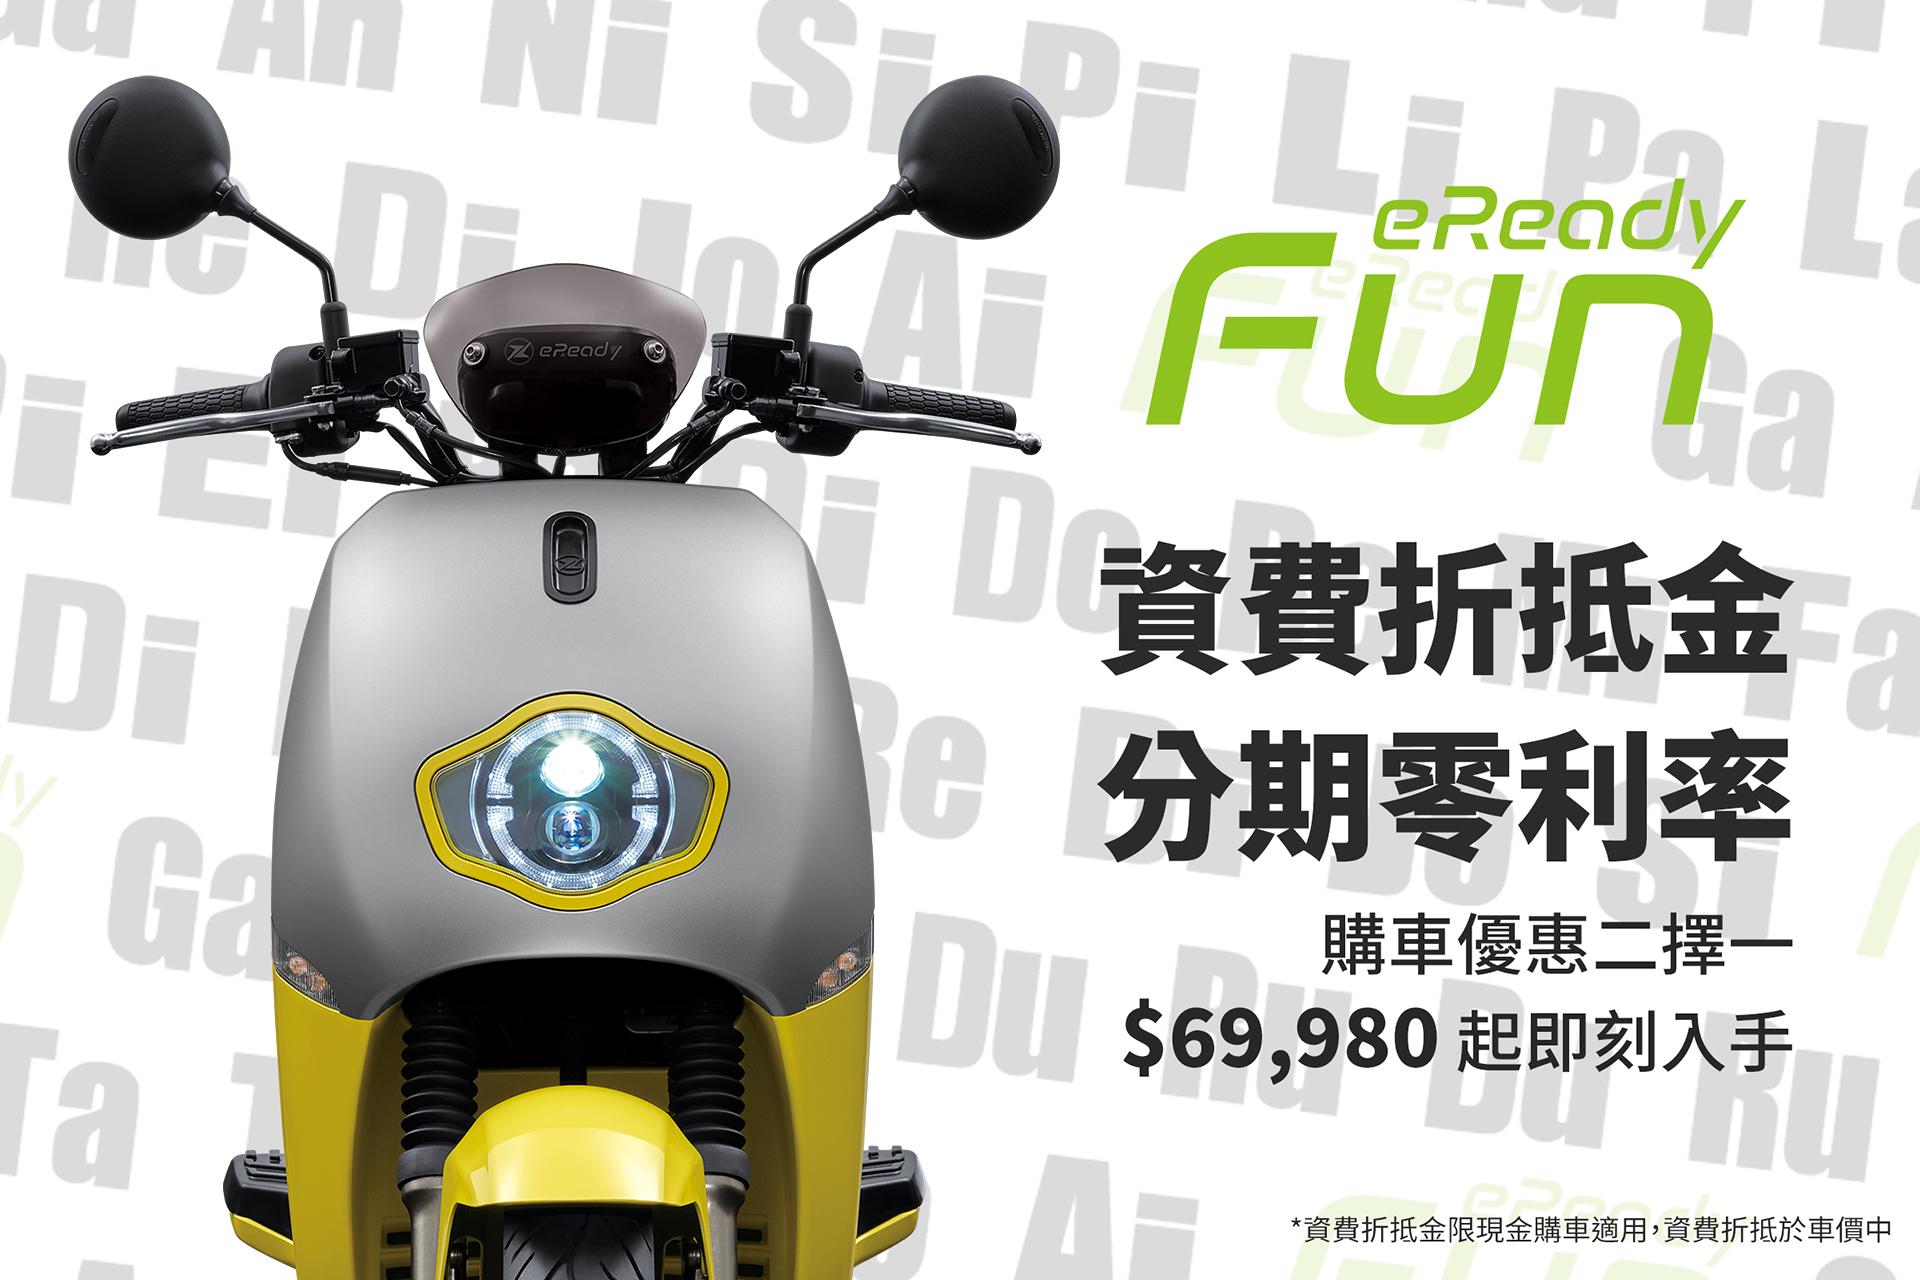 eReady Fun 限時優惠 69,980 放(FUN)膽騎。